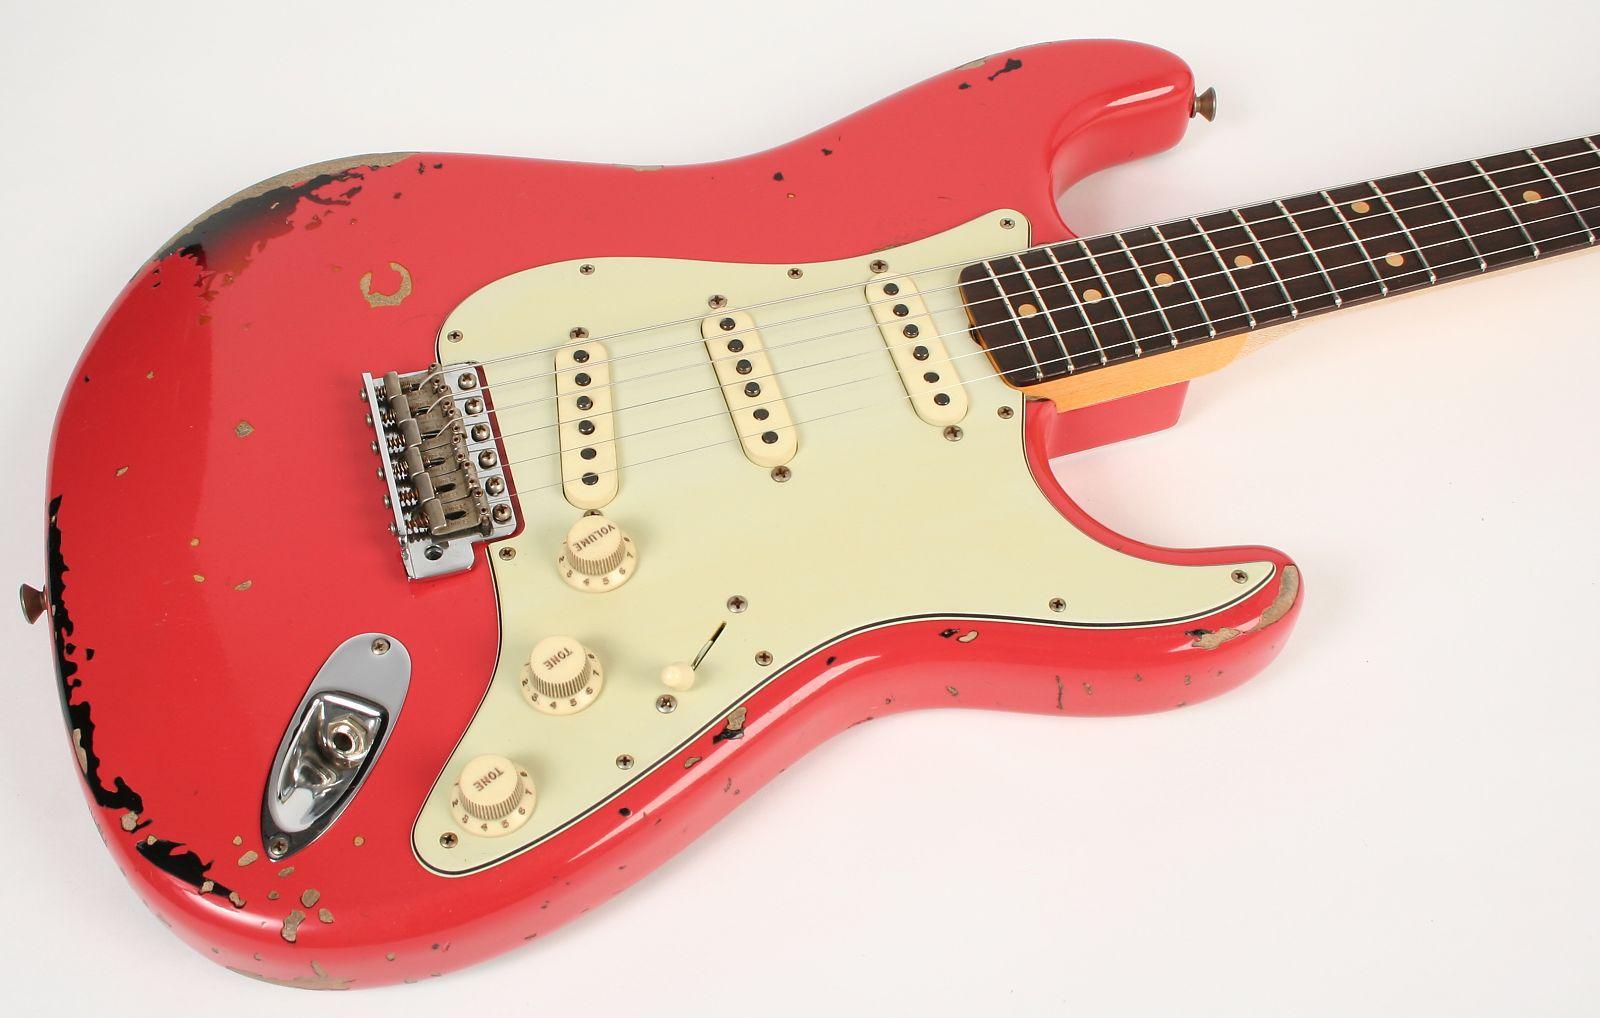 Fender Custom Shop Michael Landau 1963 Relic Stratocaster NEW Faded Fiesta  Red over 3-Color Sunburst